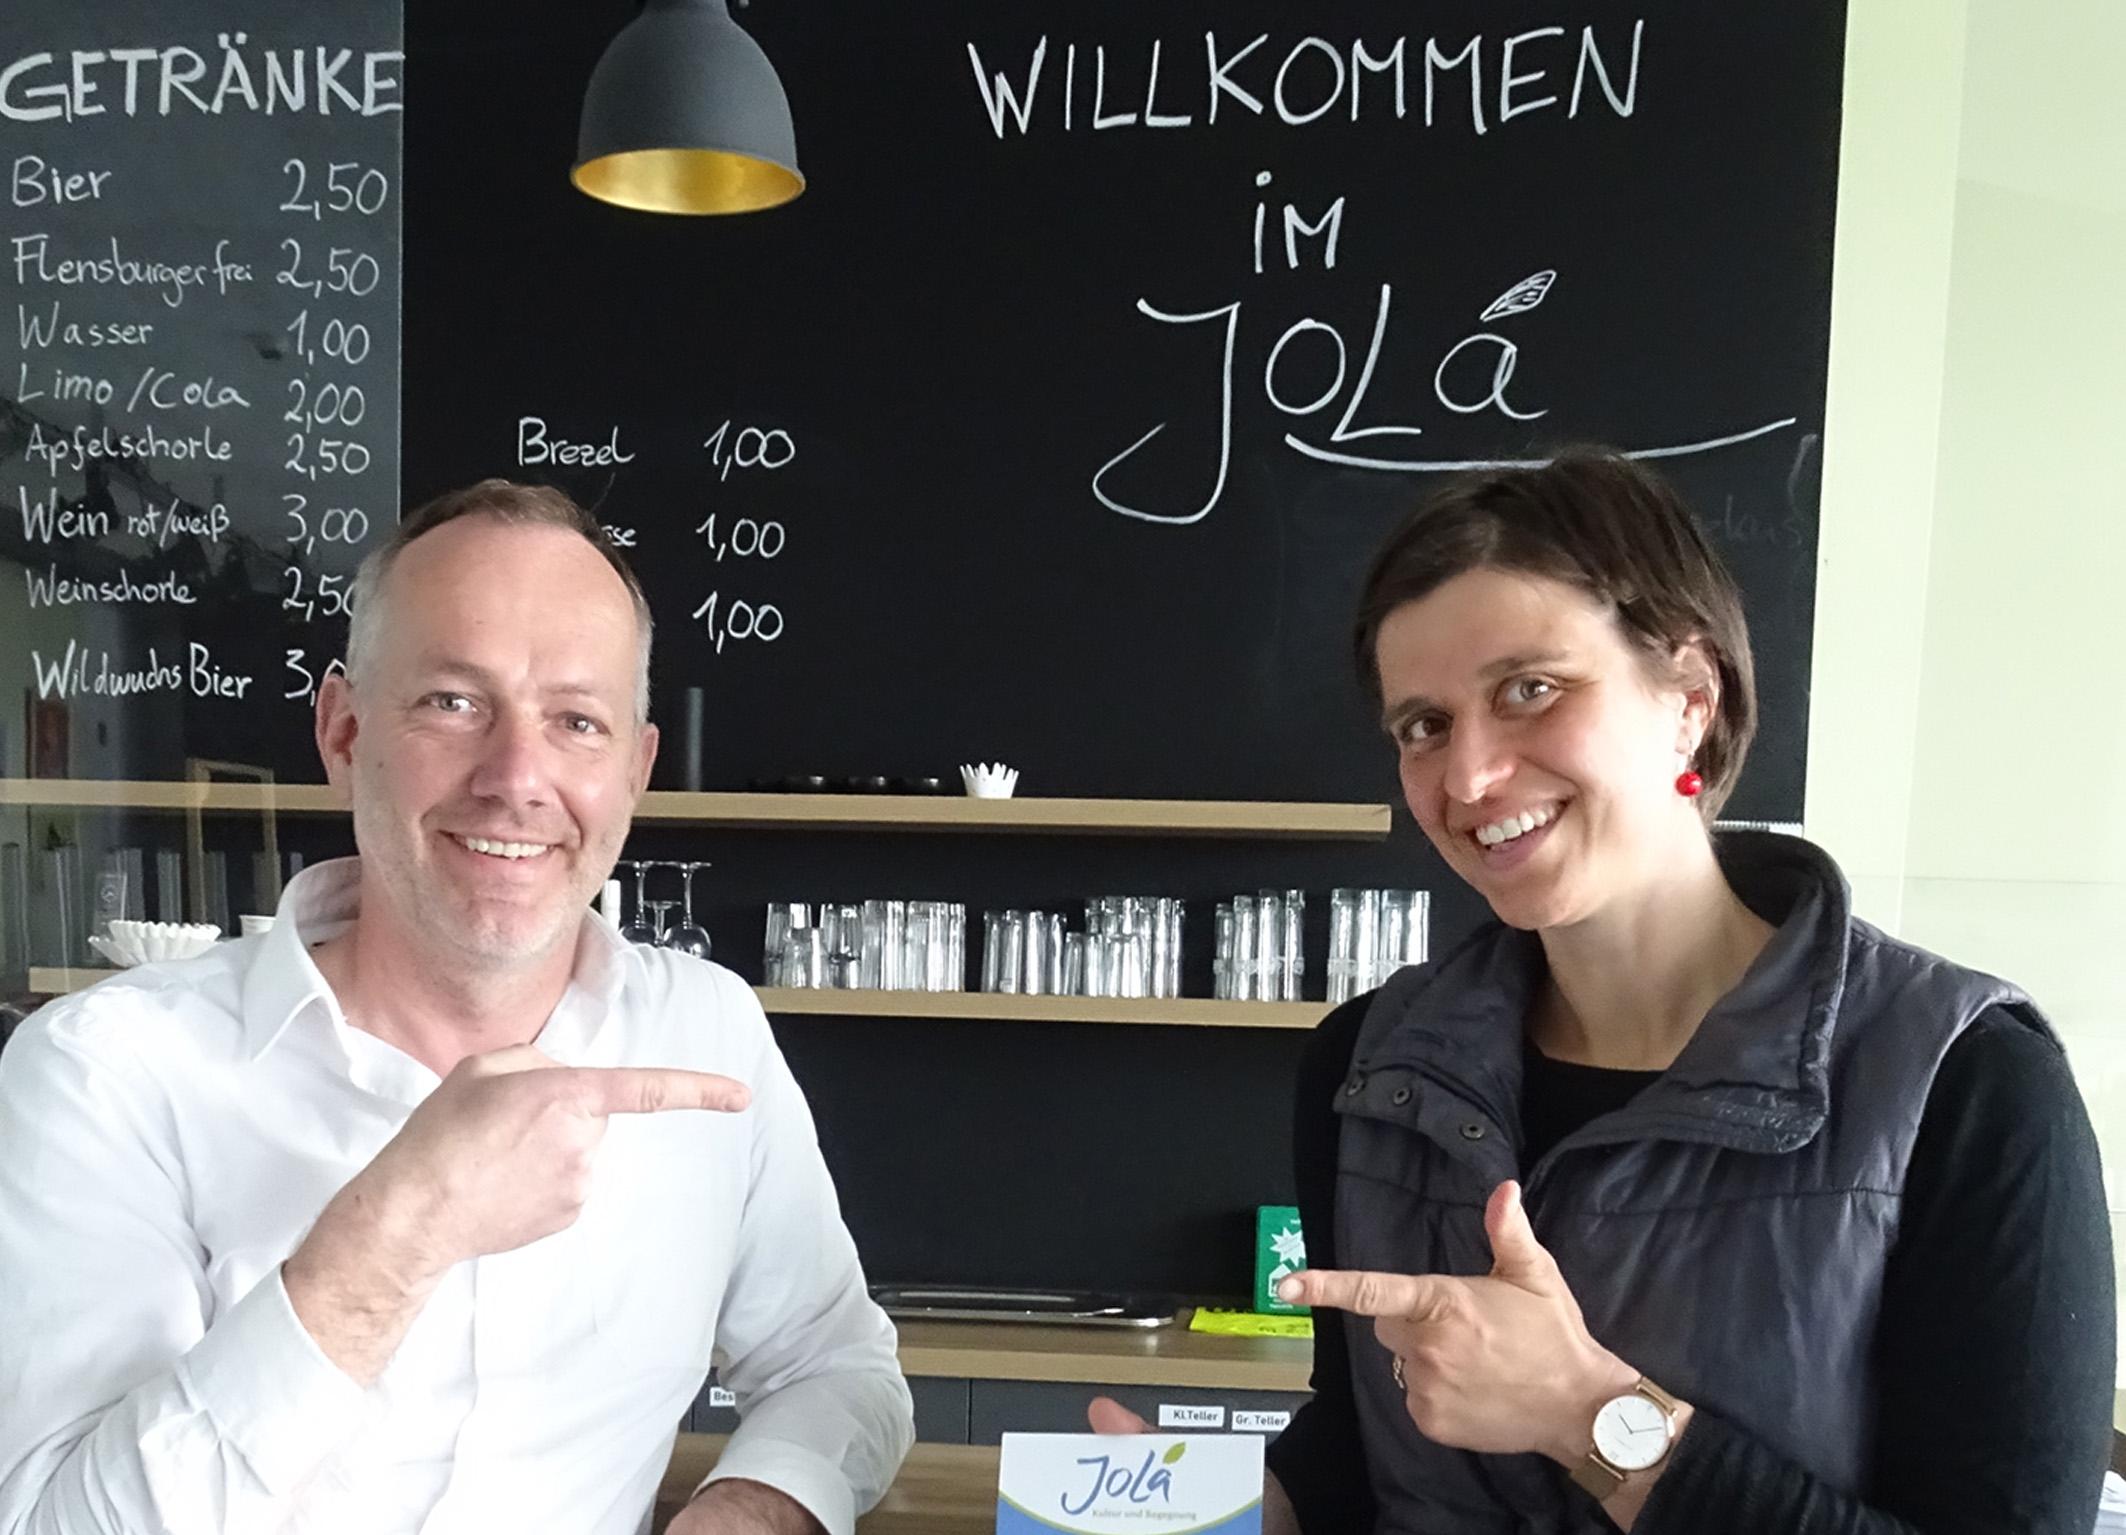 Foto_JohannaEisenschmidt_JohannesKirchberg